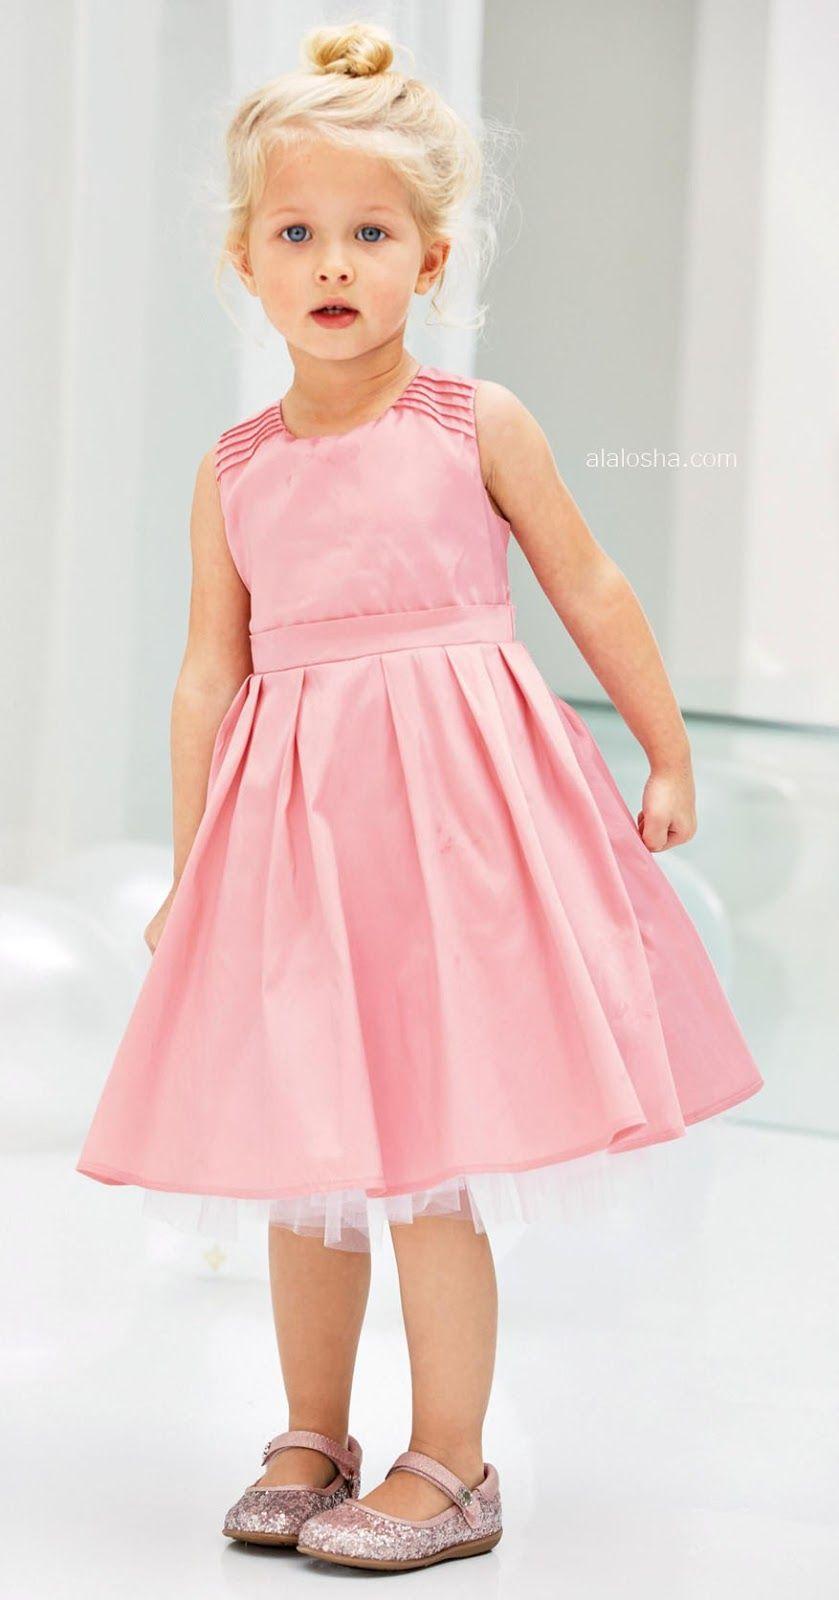 ALALOSHA: VOGUE ENFANTS: Be a little princess so easy! Go all out ...